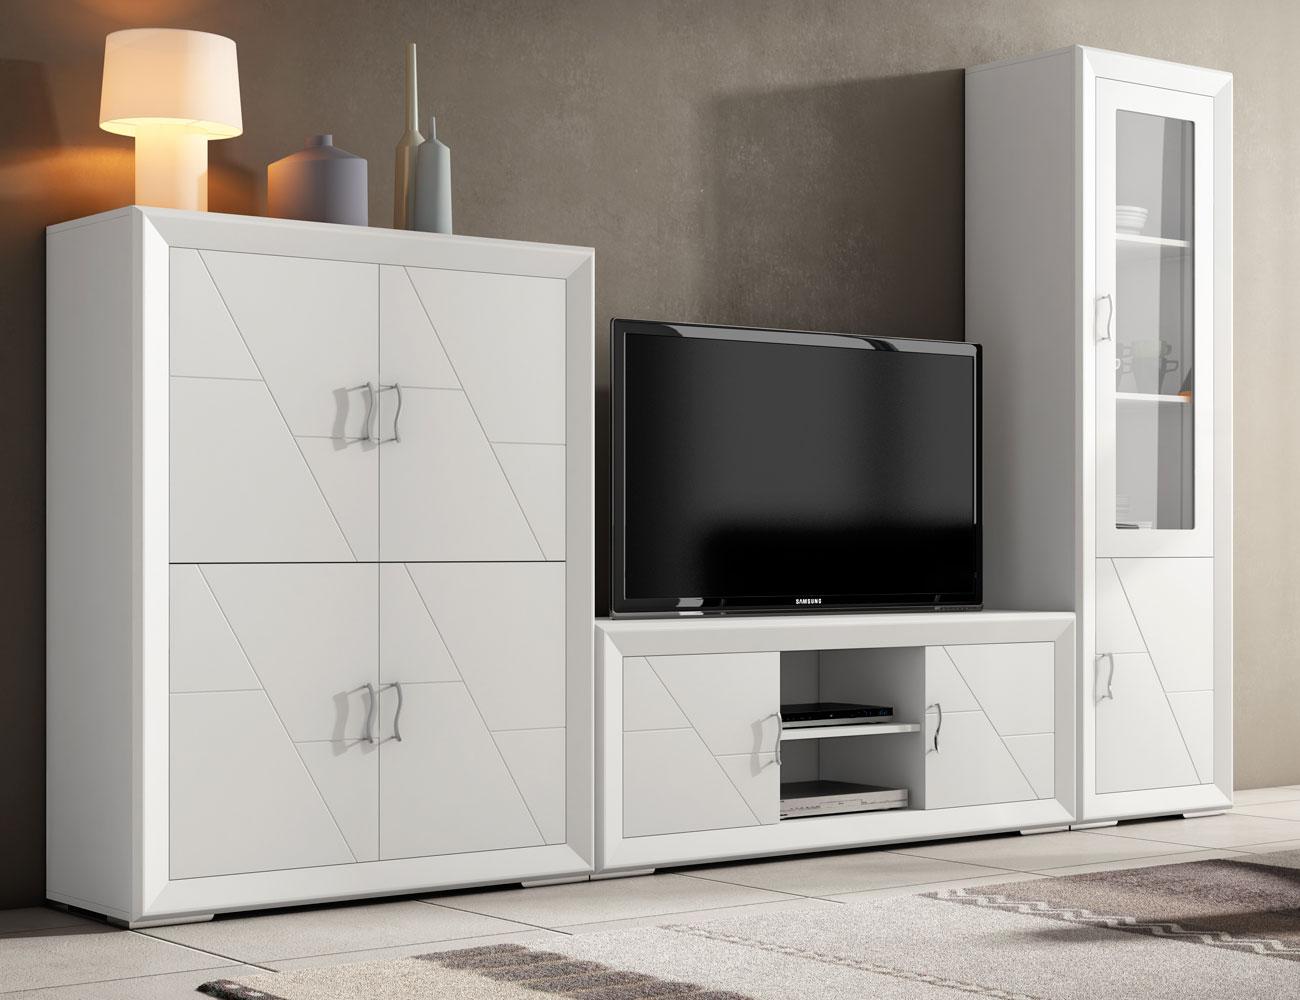 Apilable3 mueble salon comedor blanco madera dm3